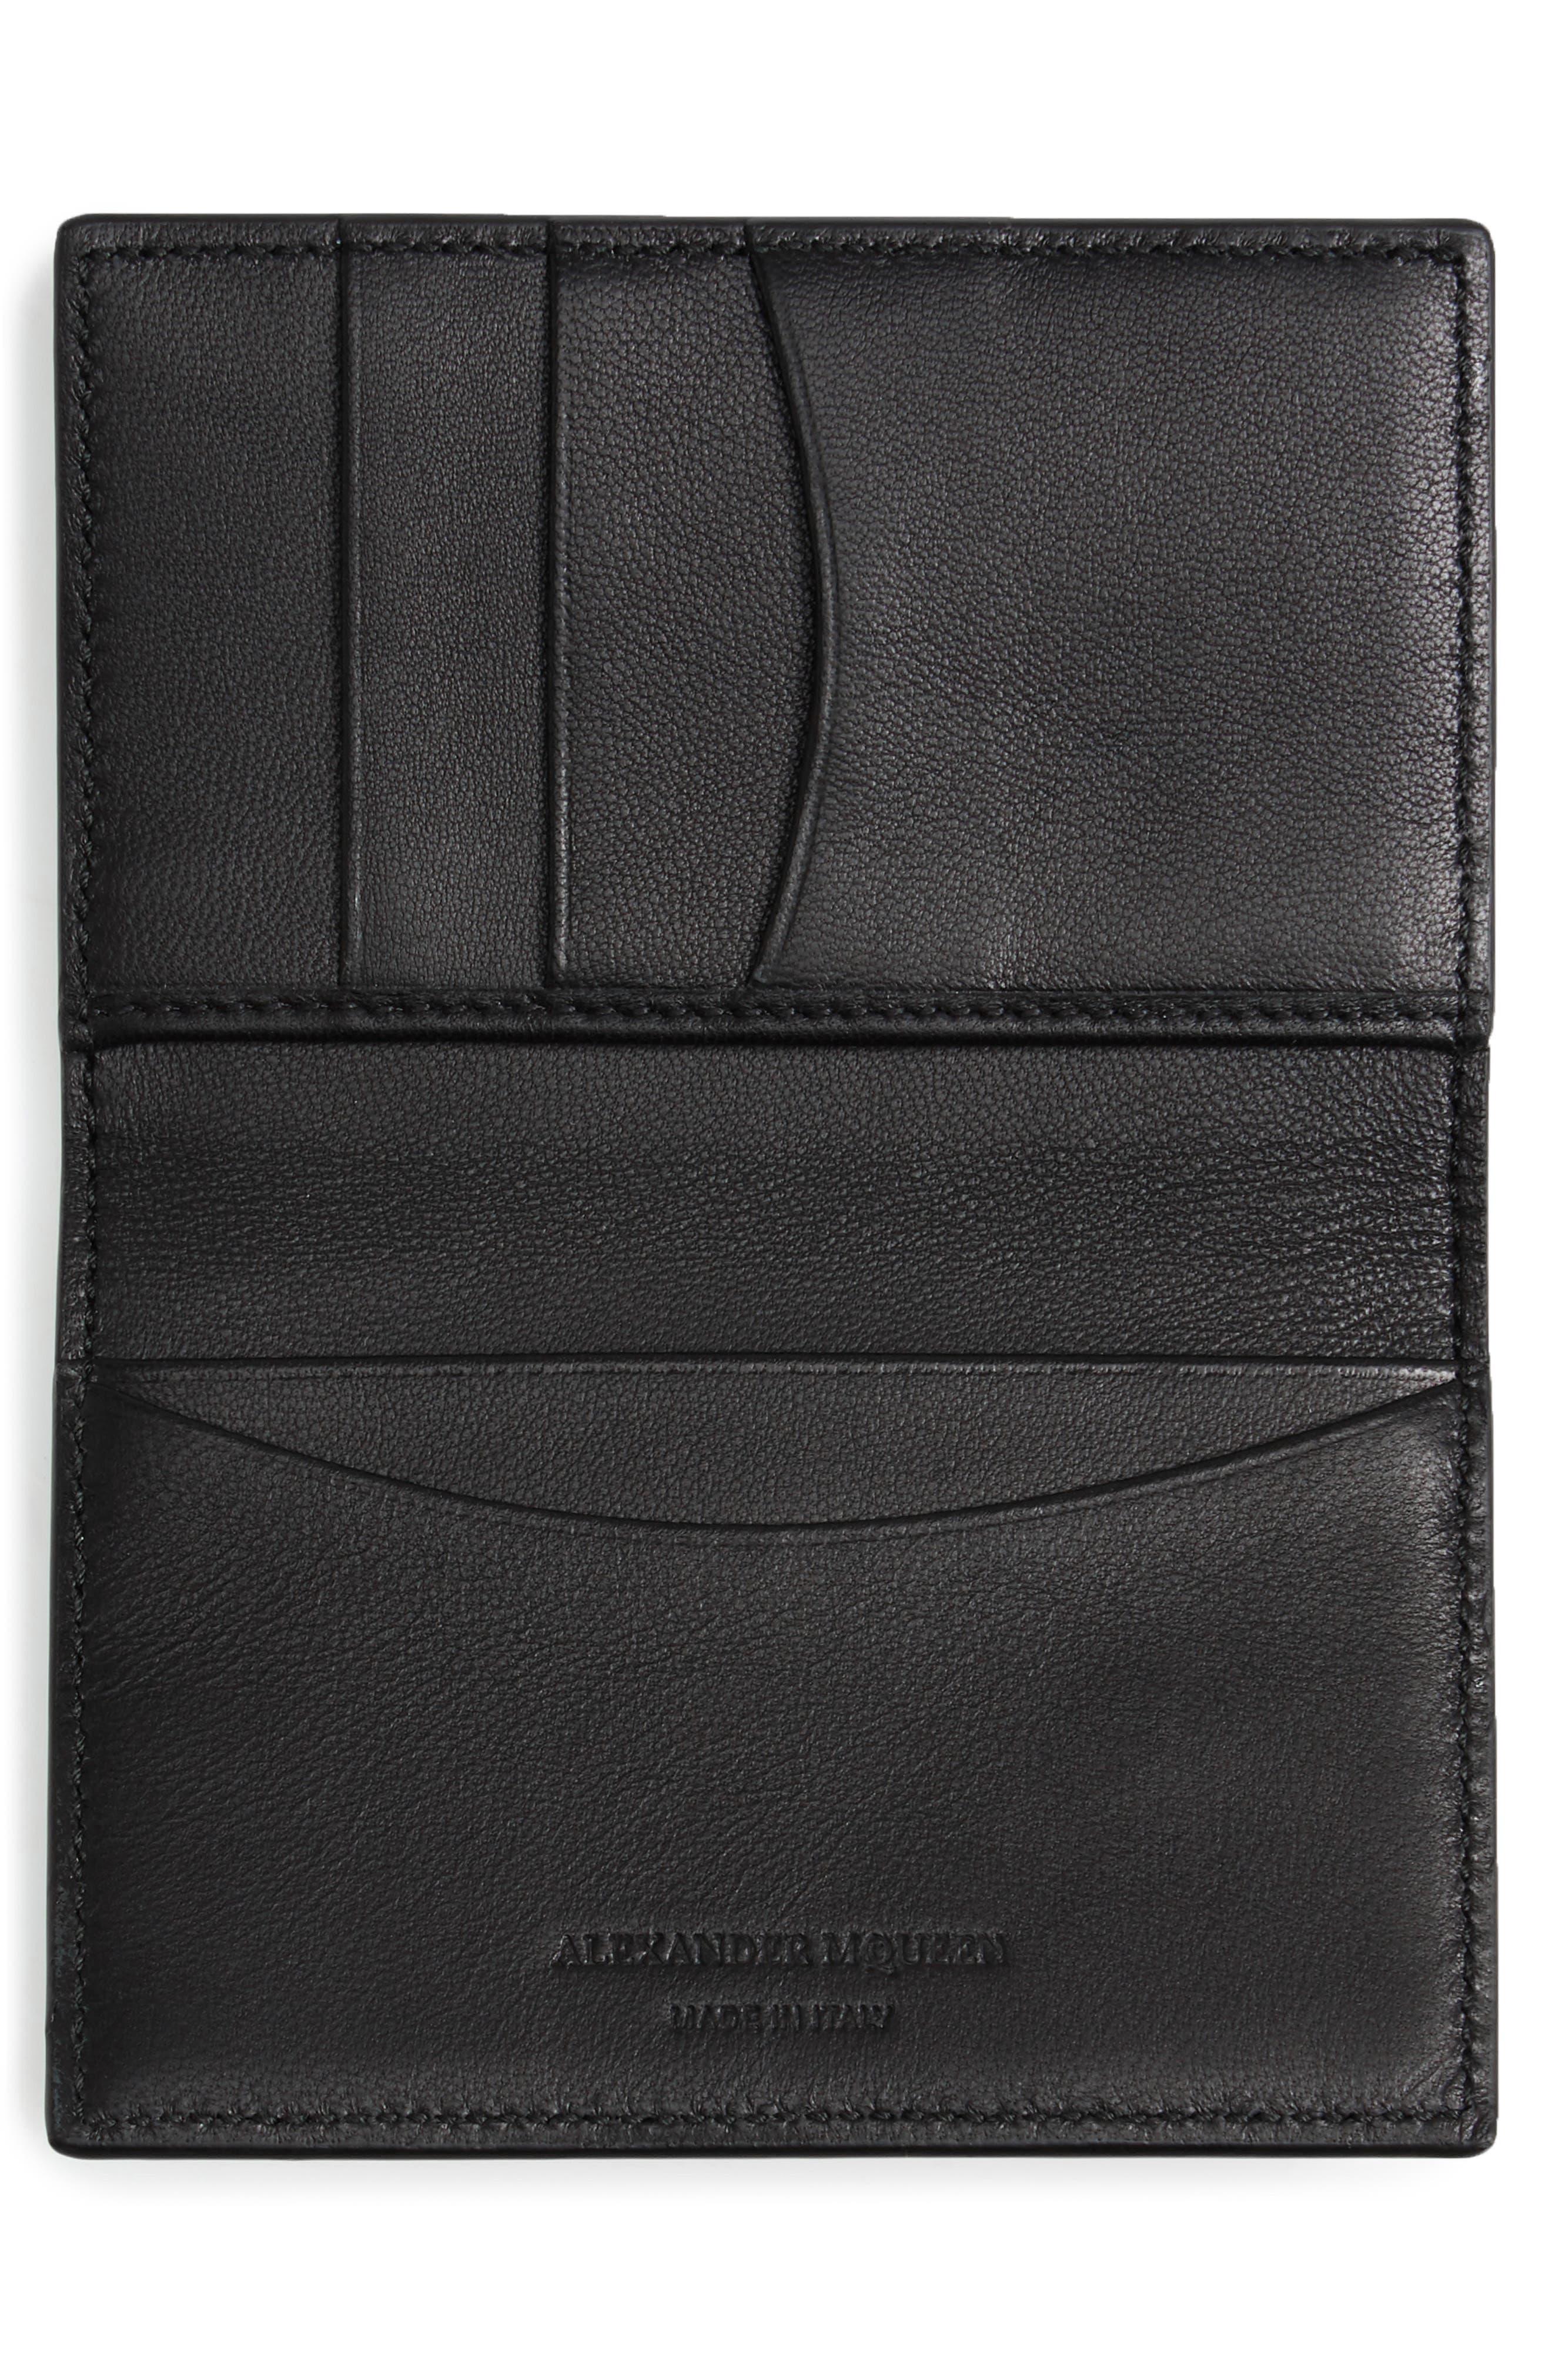 Studs & Skull Leather Card Case,                             Alternate thumbnail 2, color,                             001